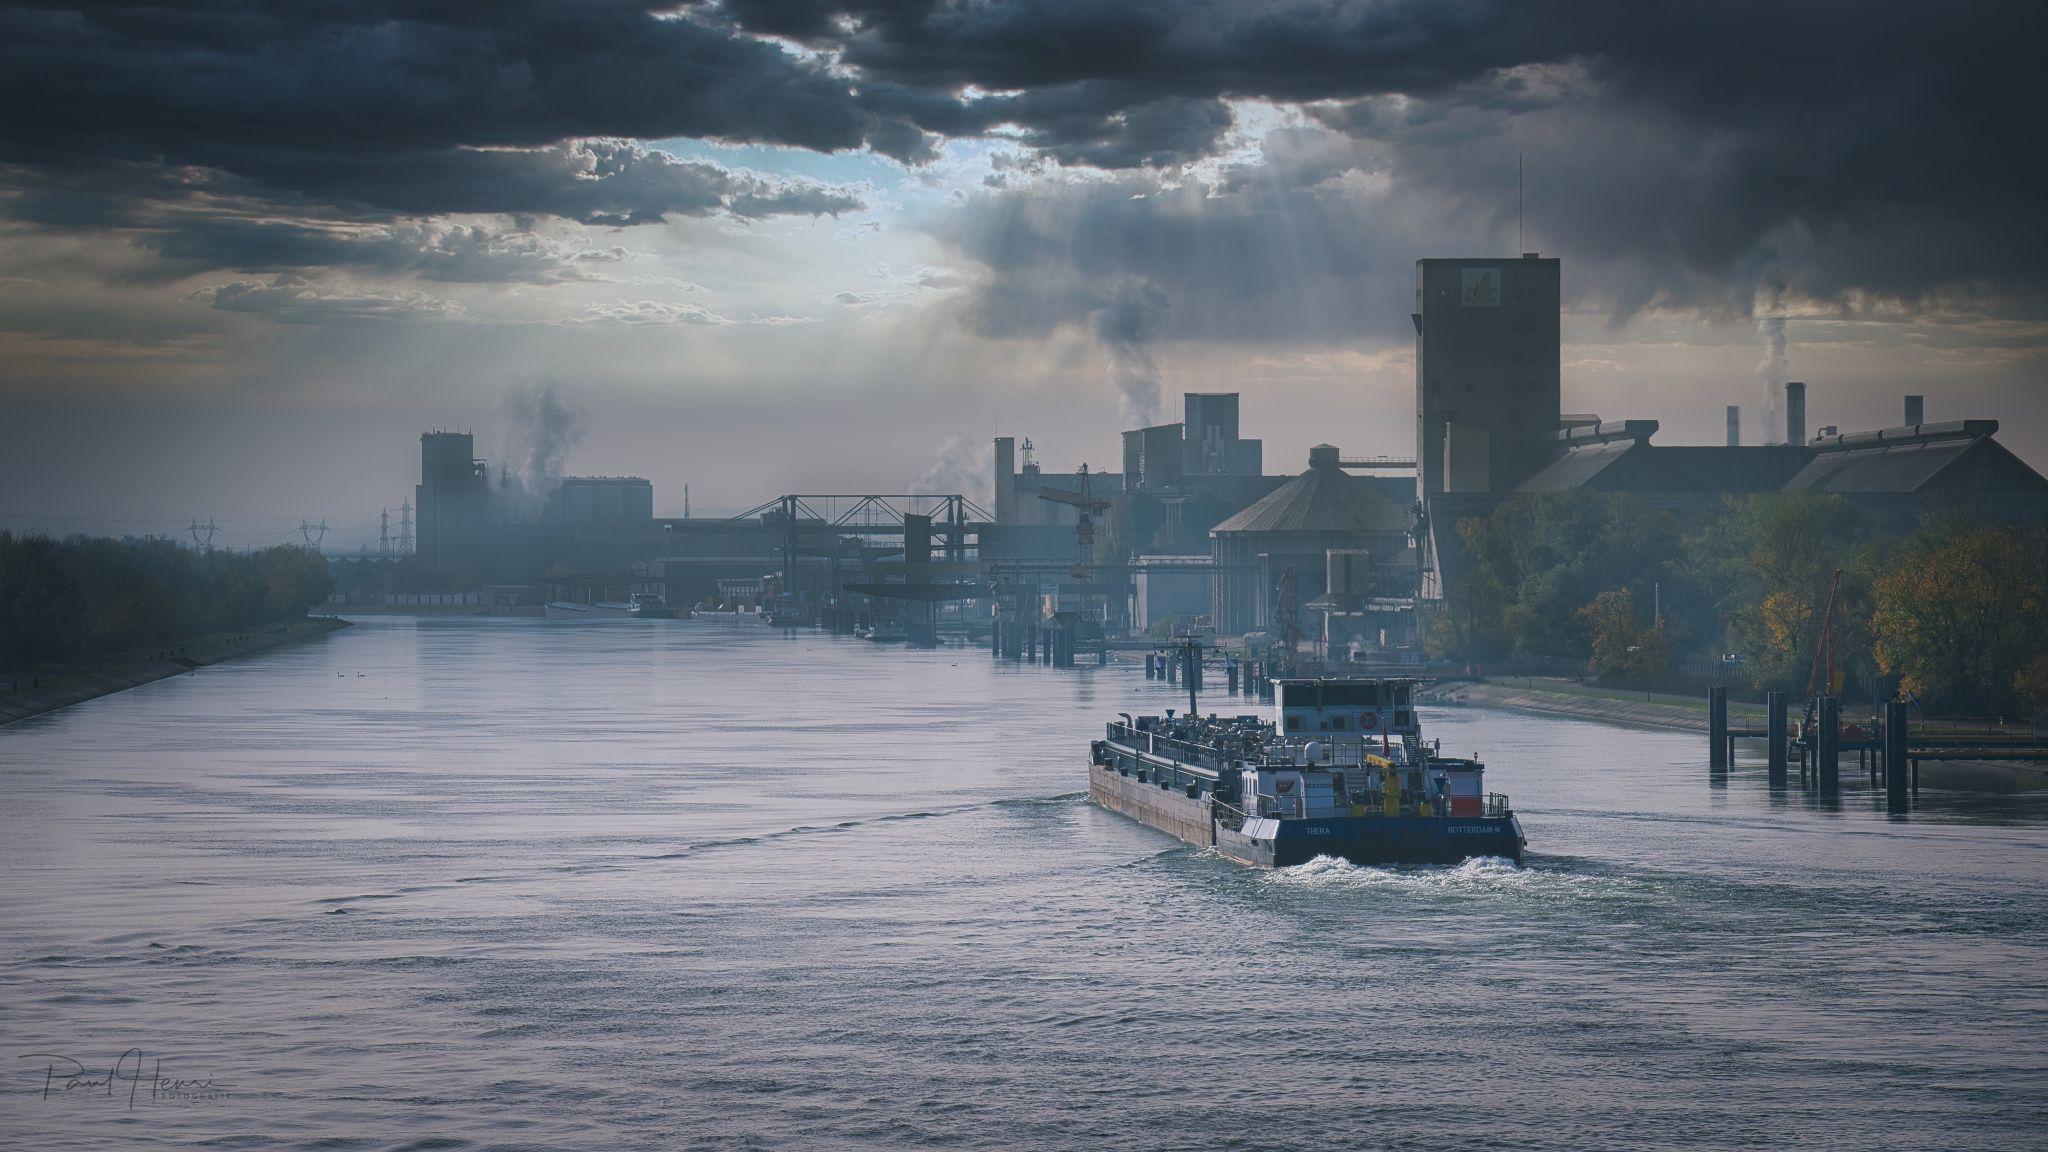 River Rhein, France